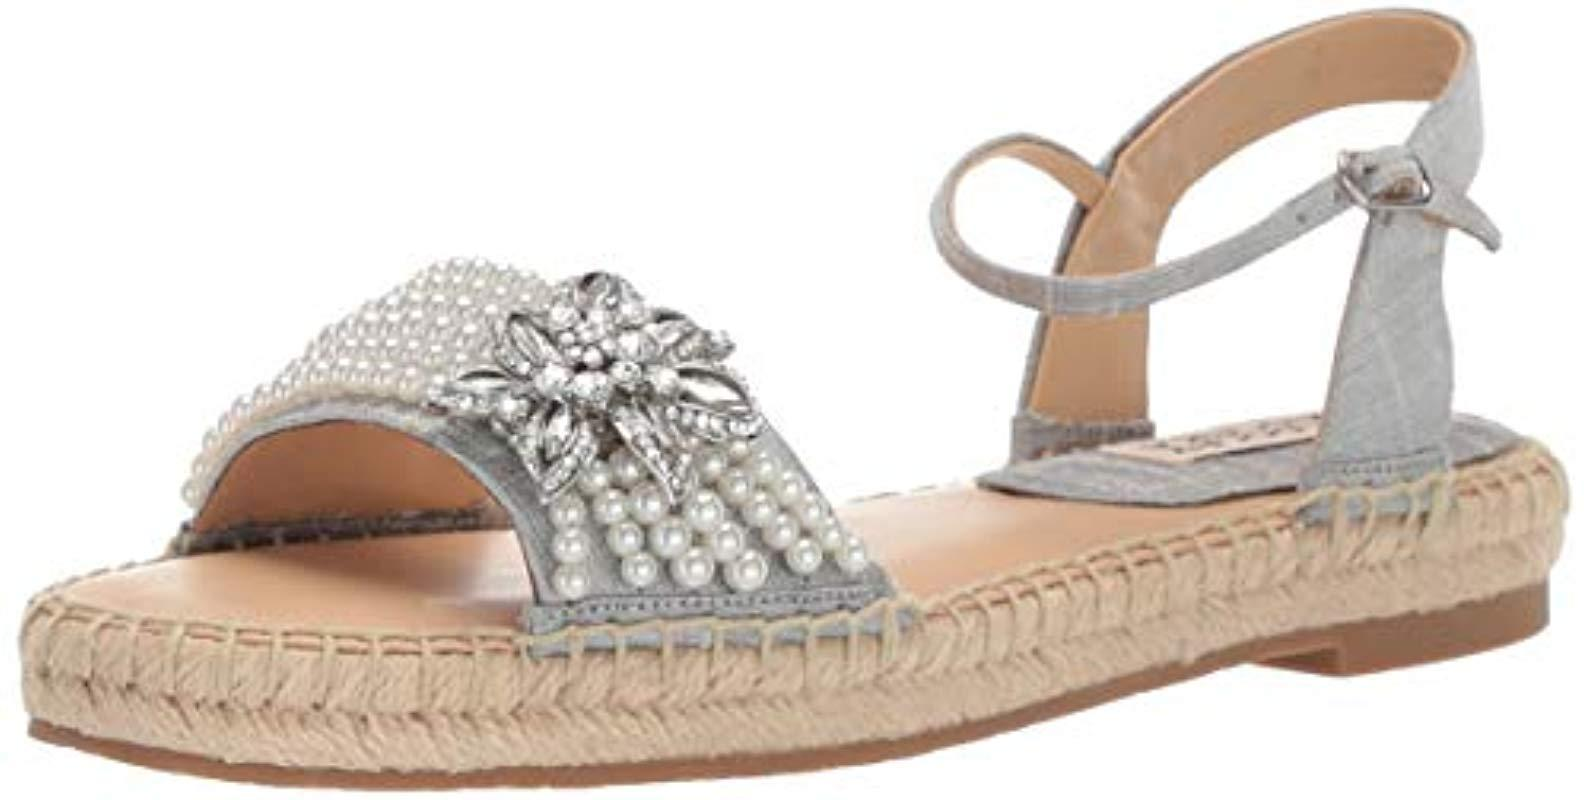 09a9b5a3e81 Lyst - Badgley Mischka Leandra Espadrille Wedge Sandal in Metallic